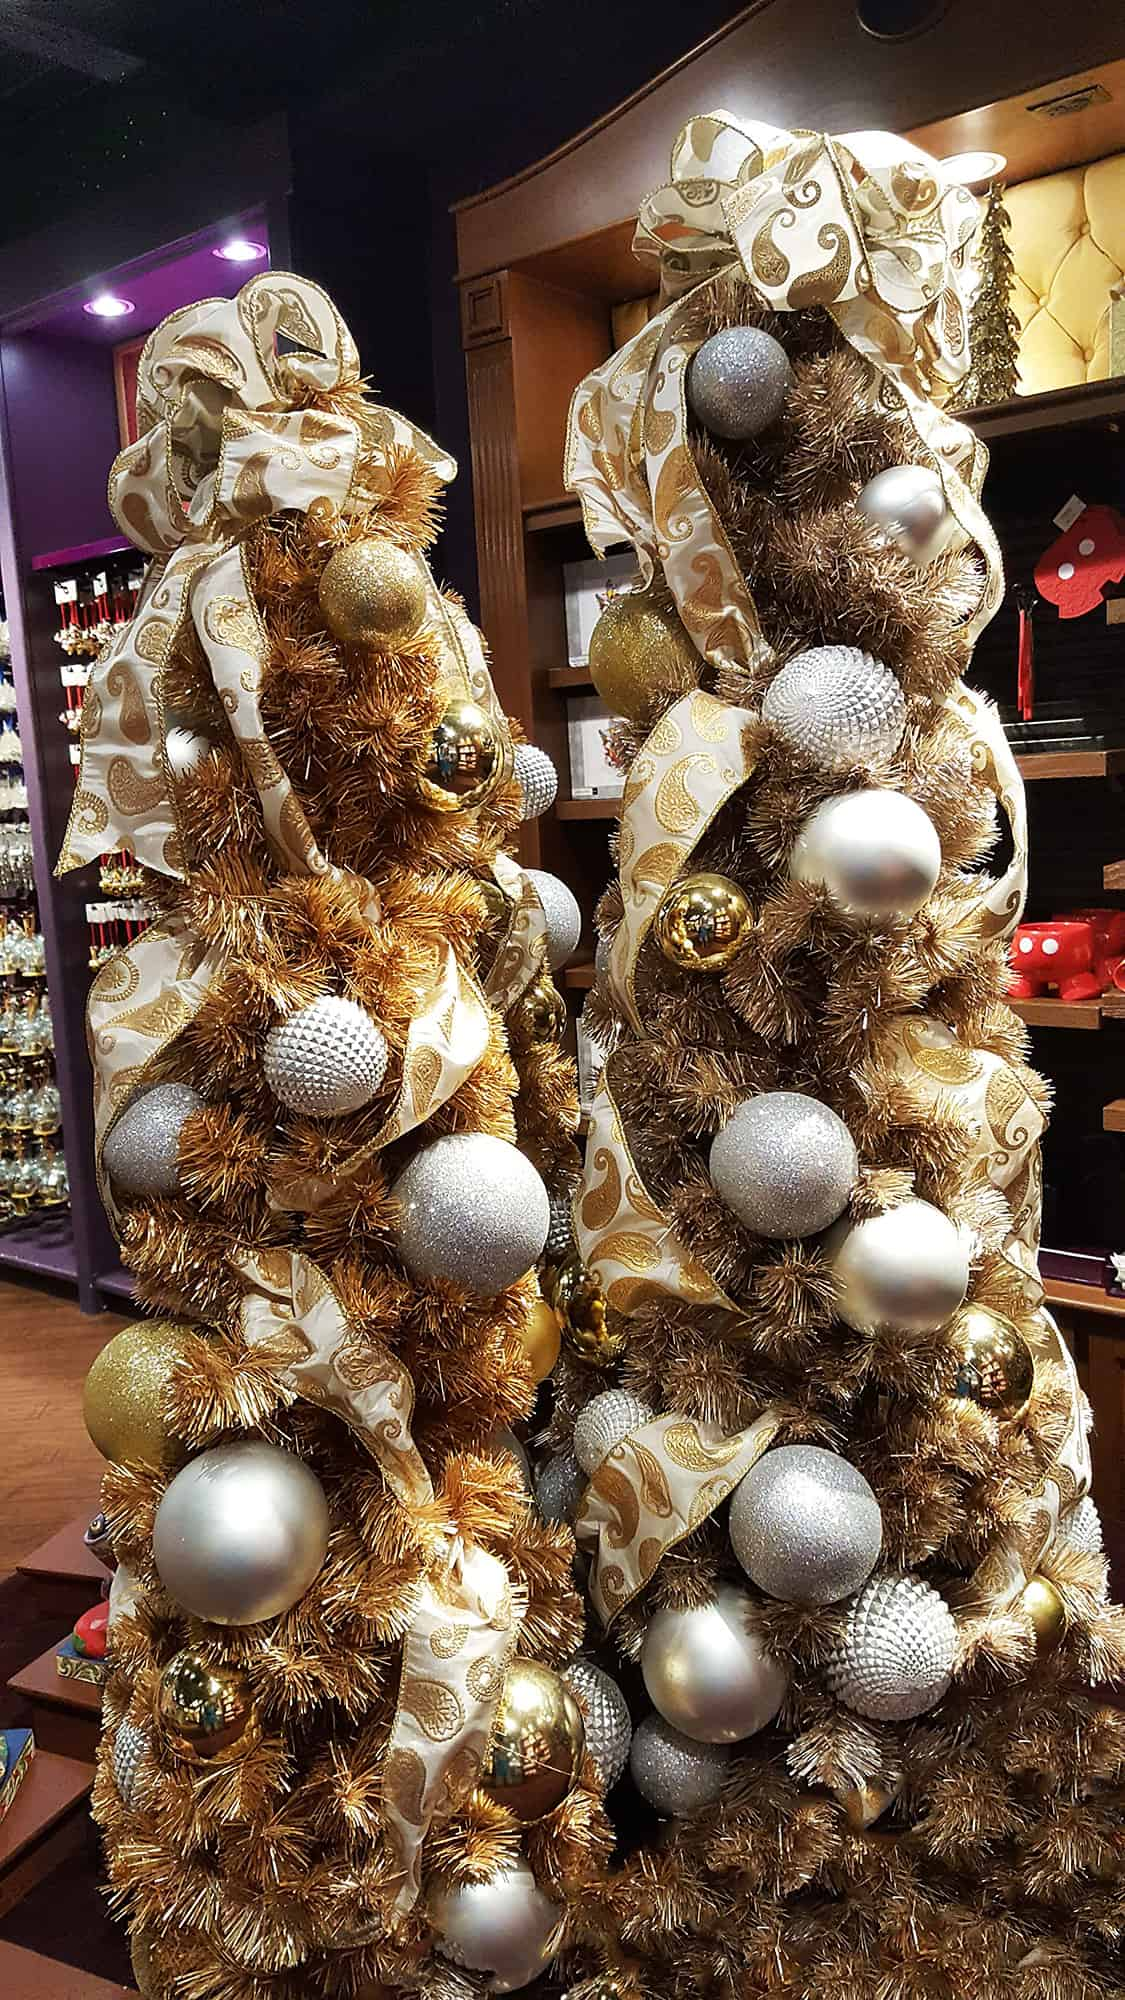 Seit Wann Gibt Es Christbaumkugeln.Weihnachtskugeln Berlin Christbaumkugeln